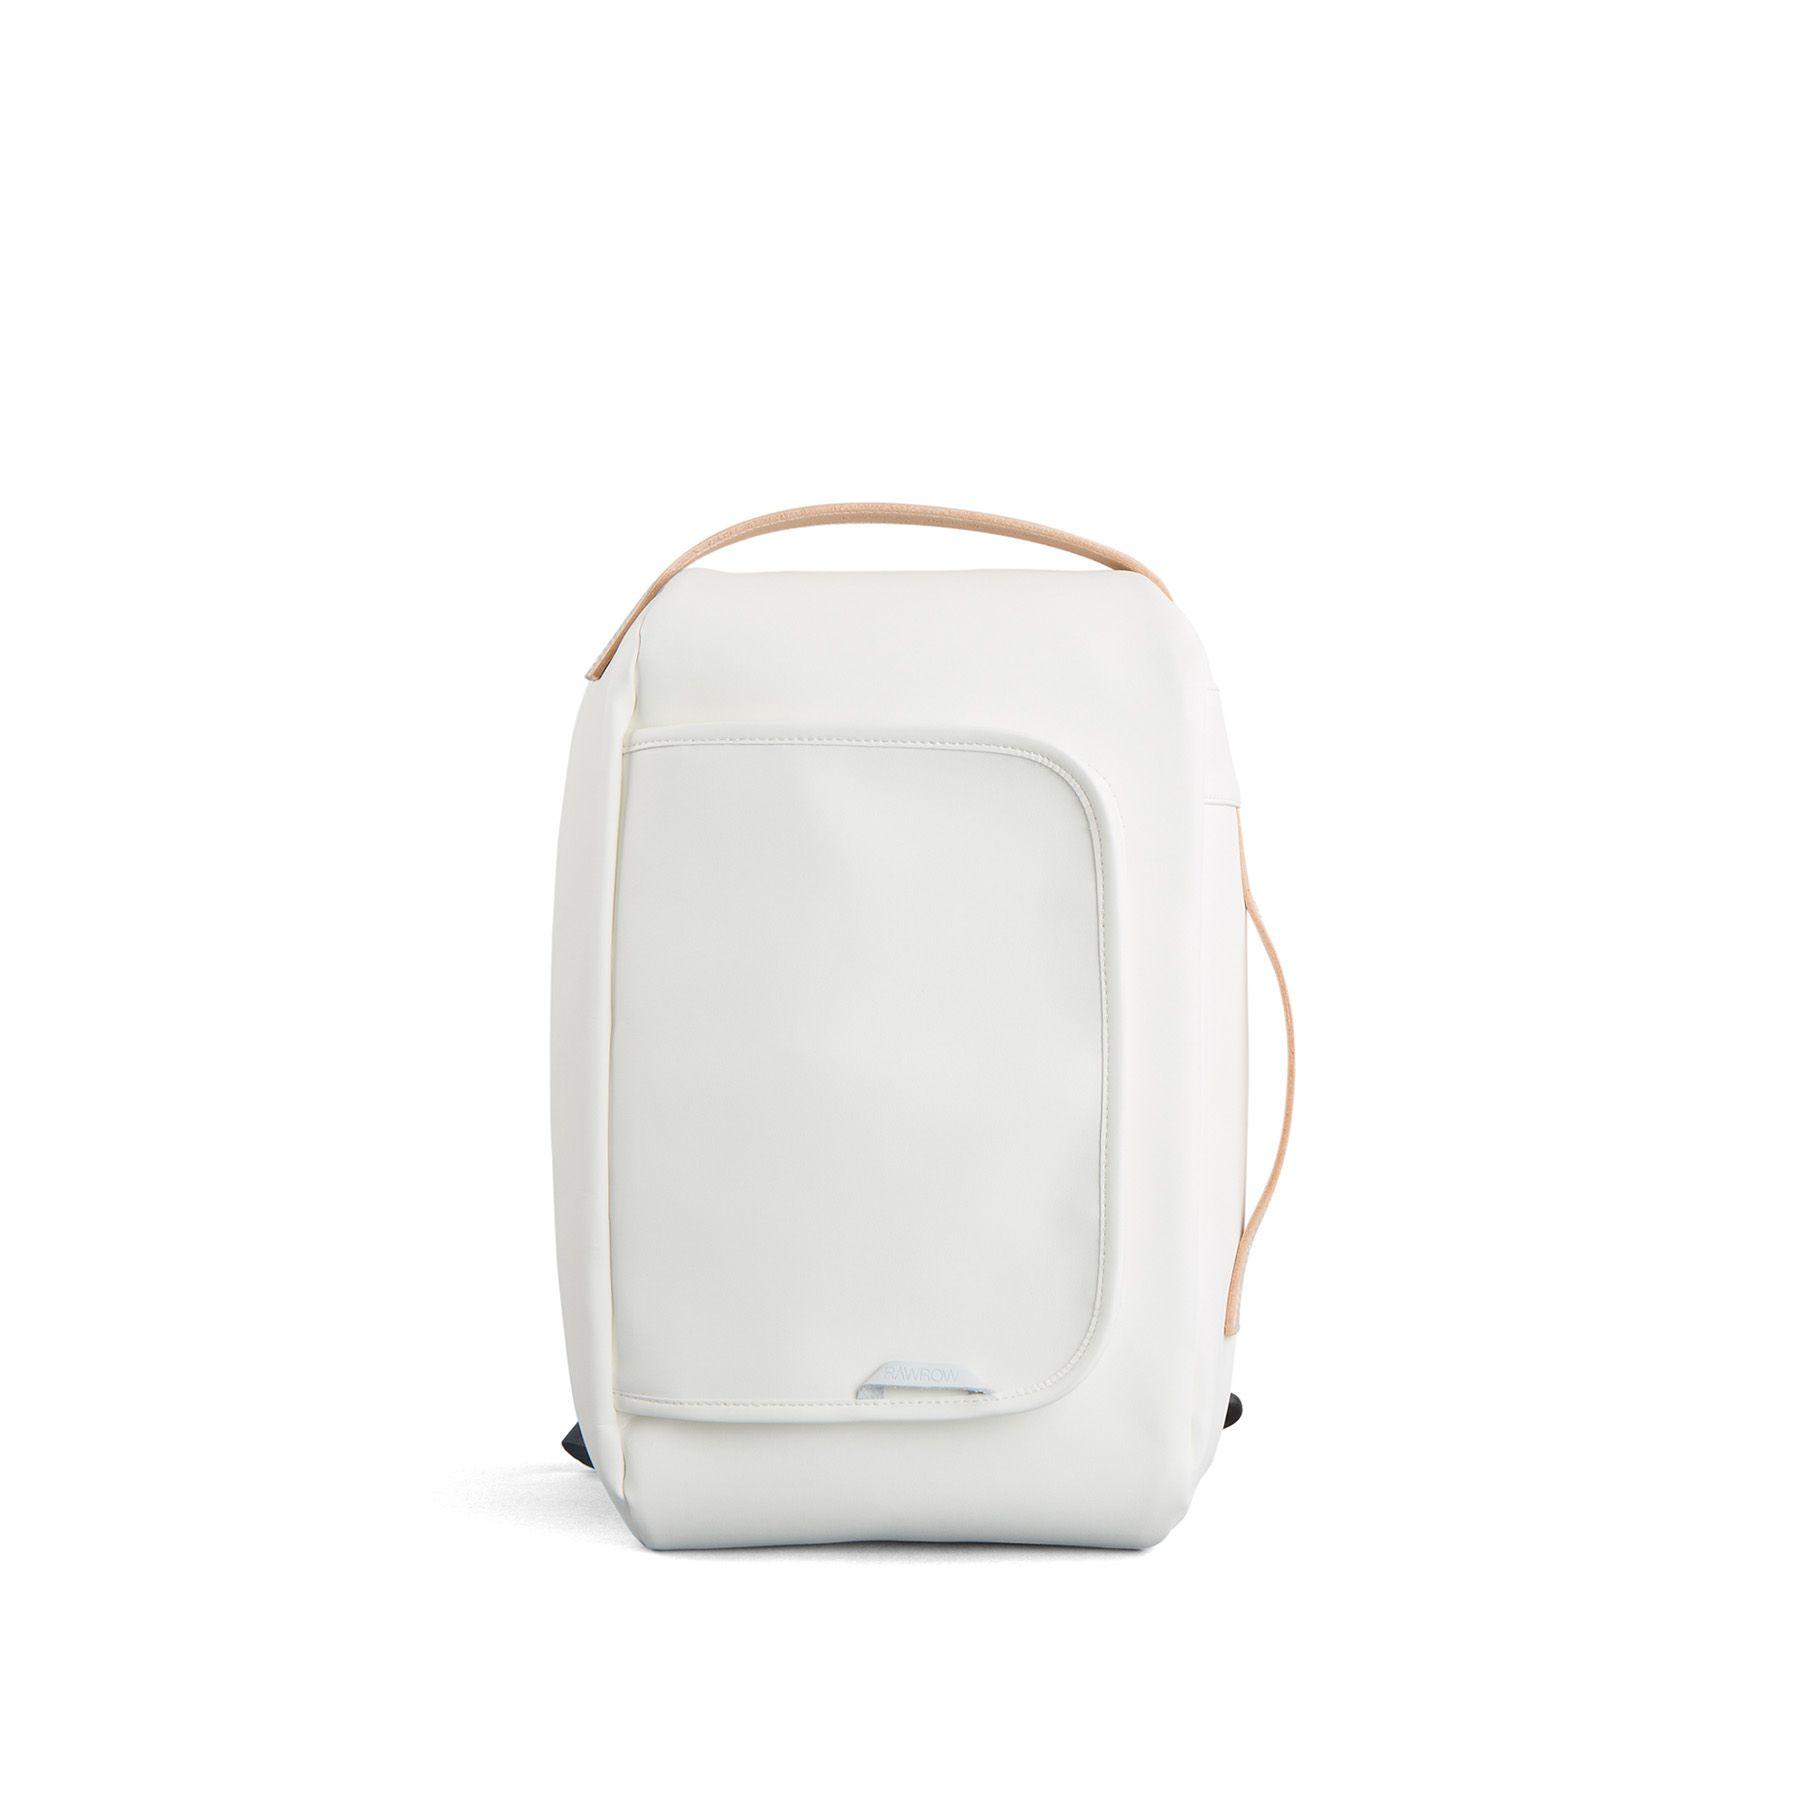 be8c80a2331 로우로우] R BAG 207 MICROFIBRE WHITE - 2017 | Pinterest